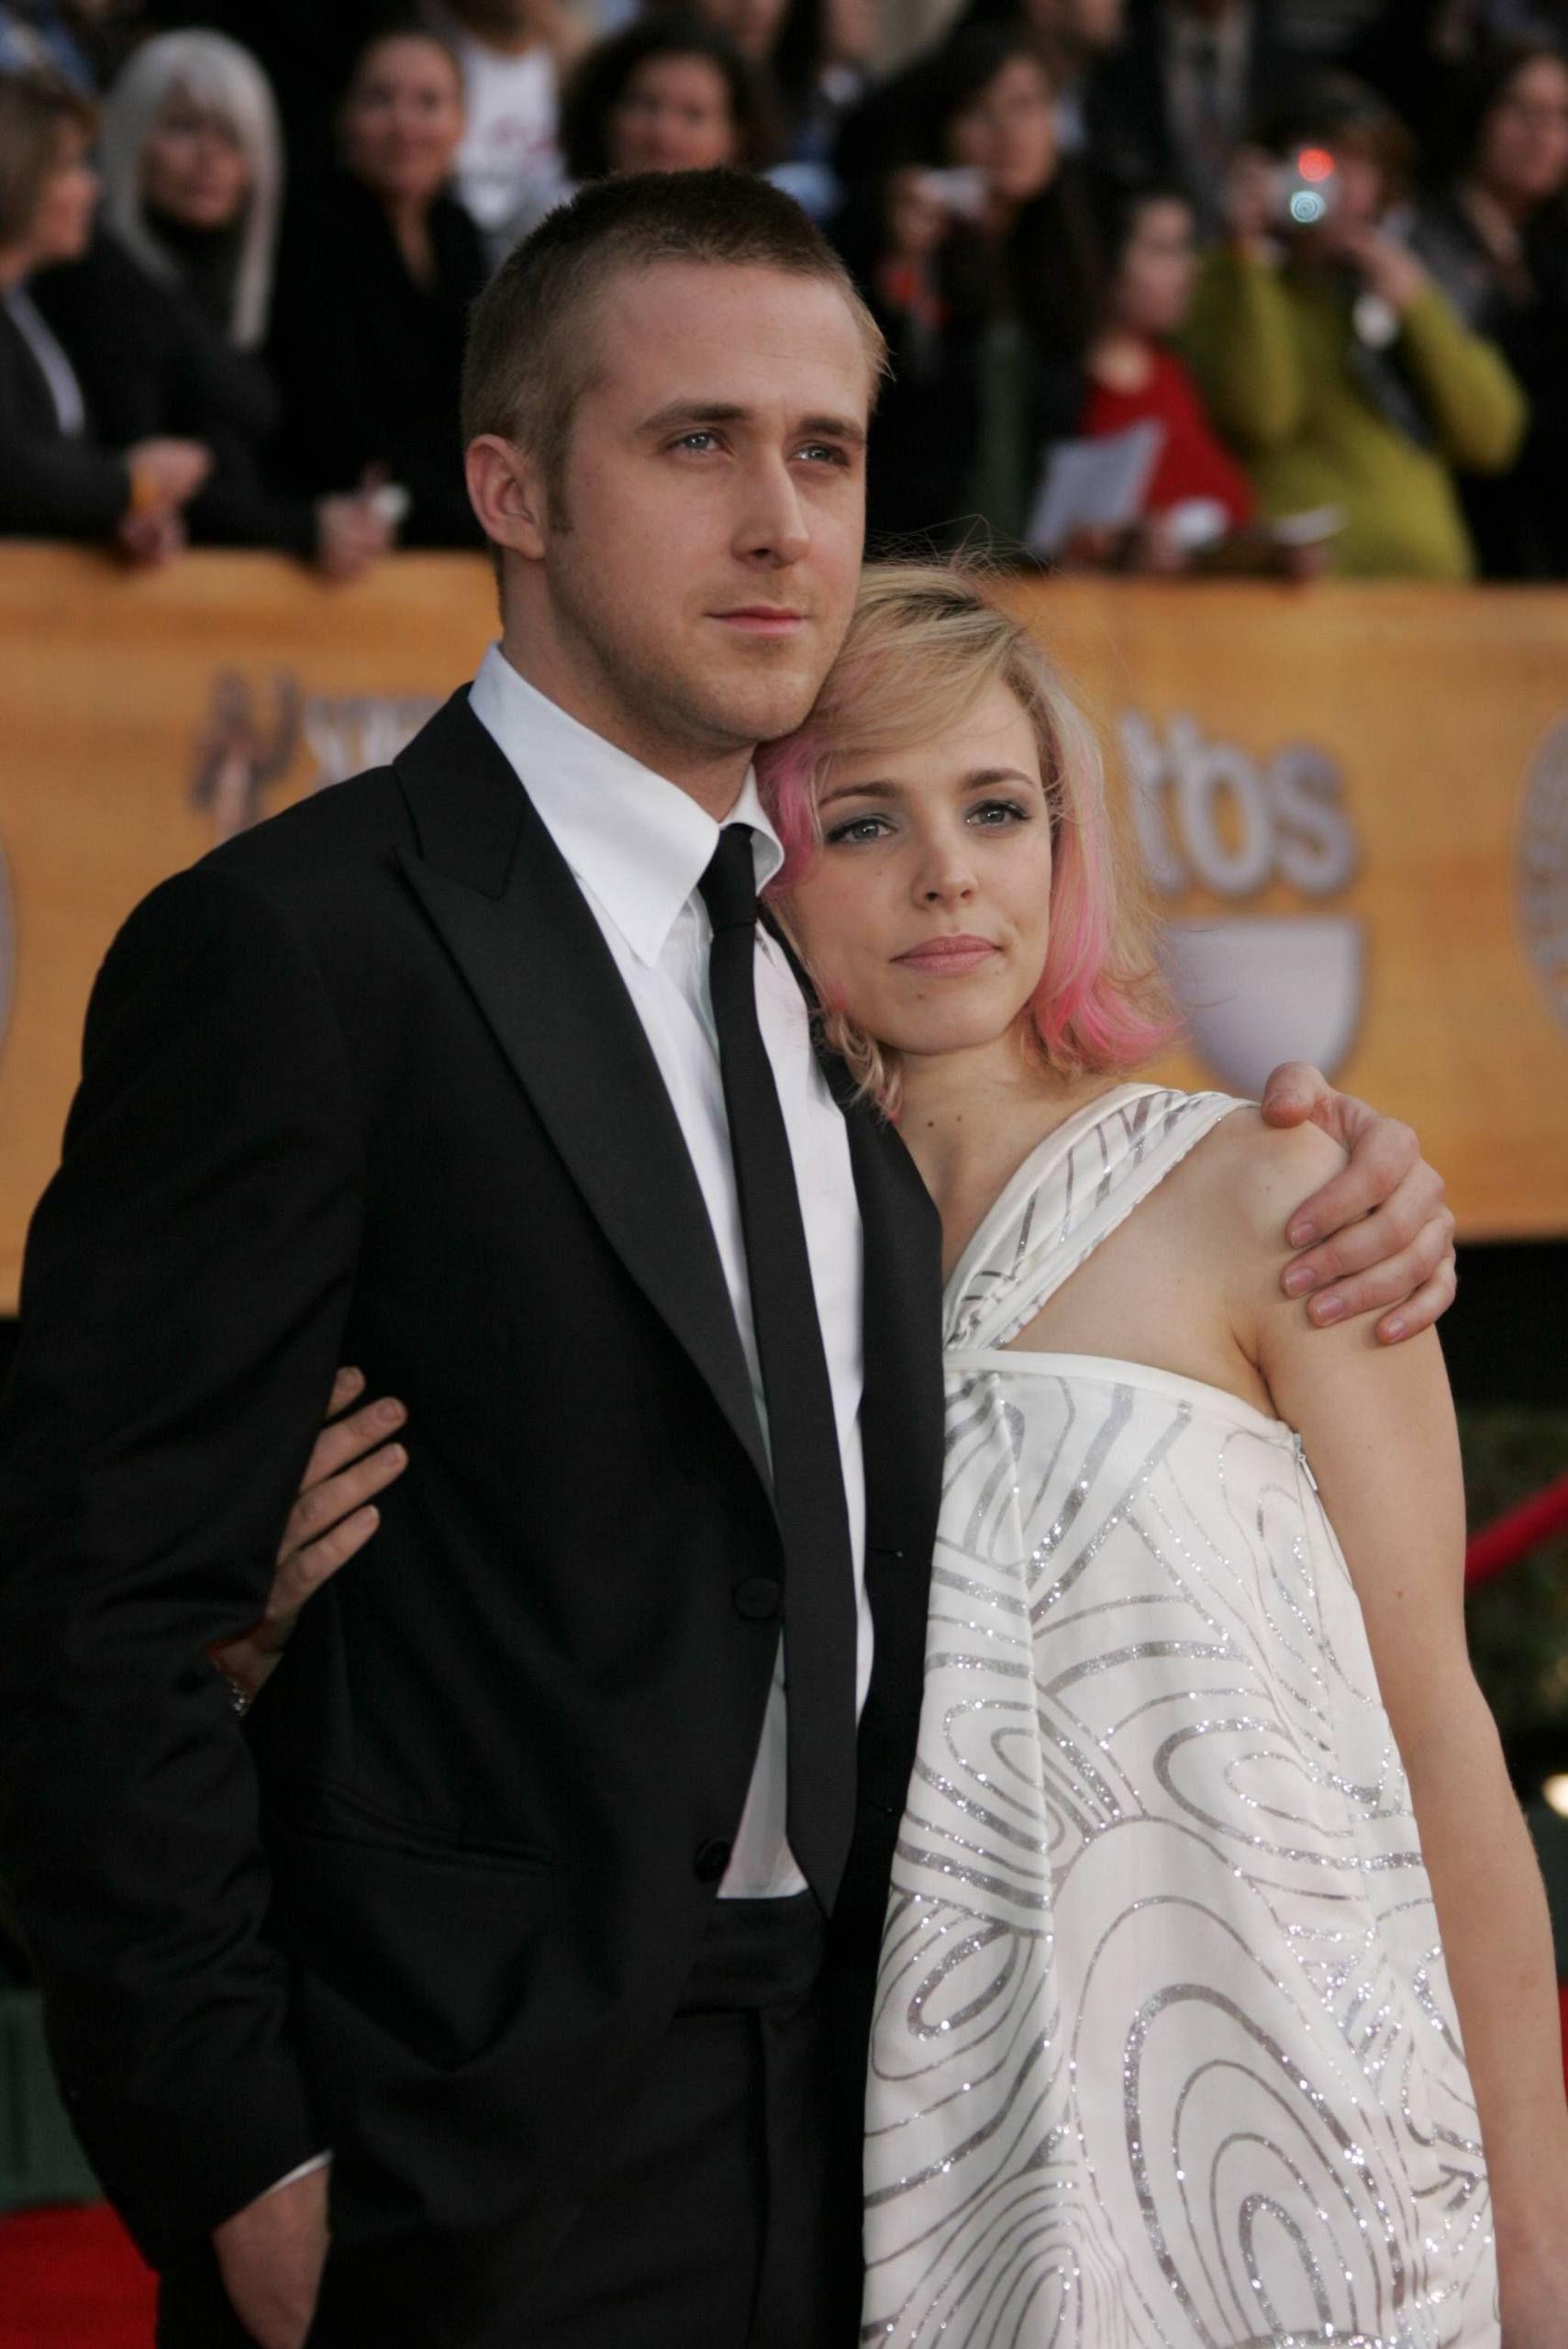 rachel mcadams & ryan gosling - maybe someday again?